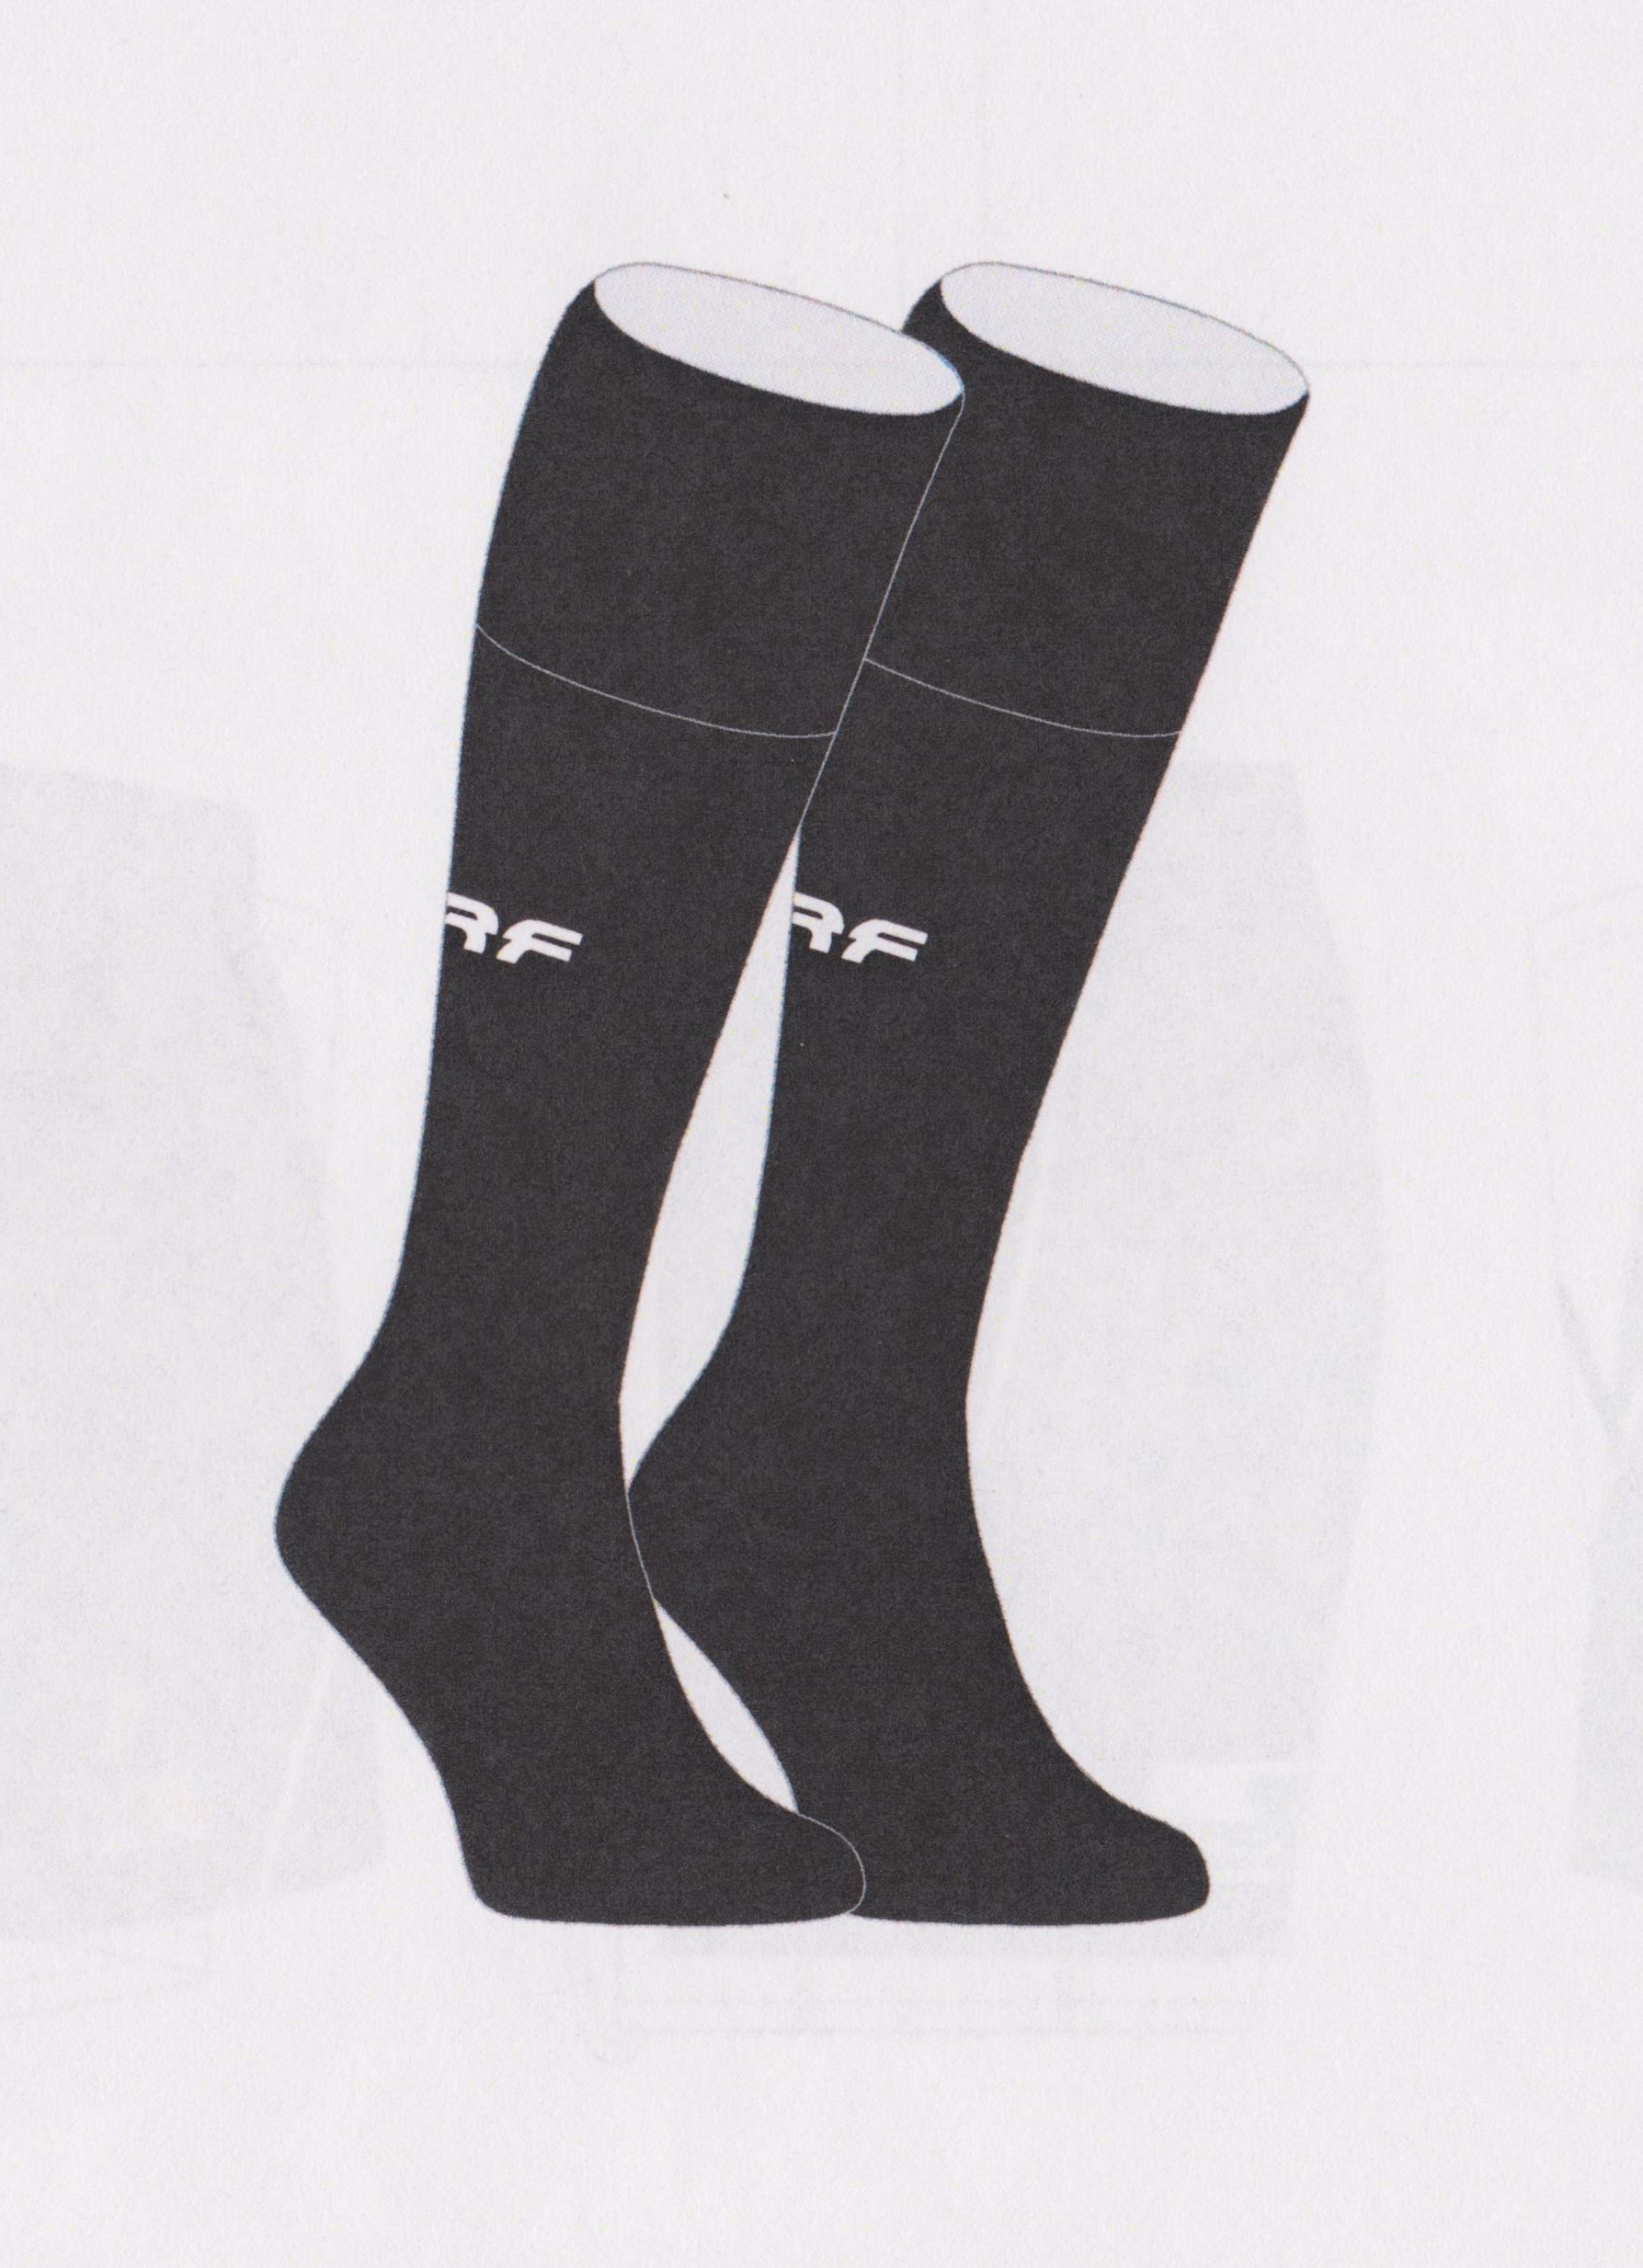 Socks - $15